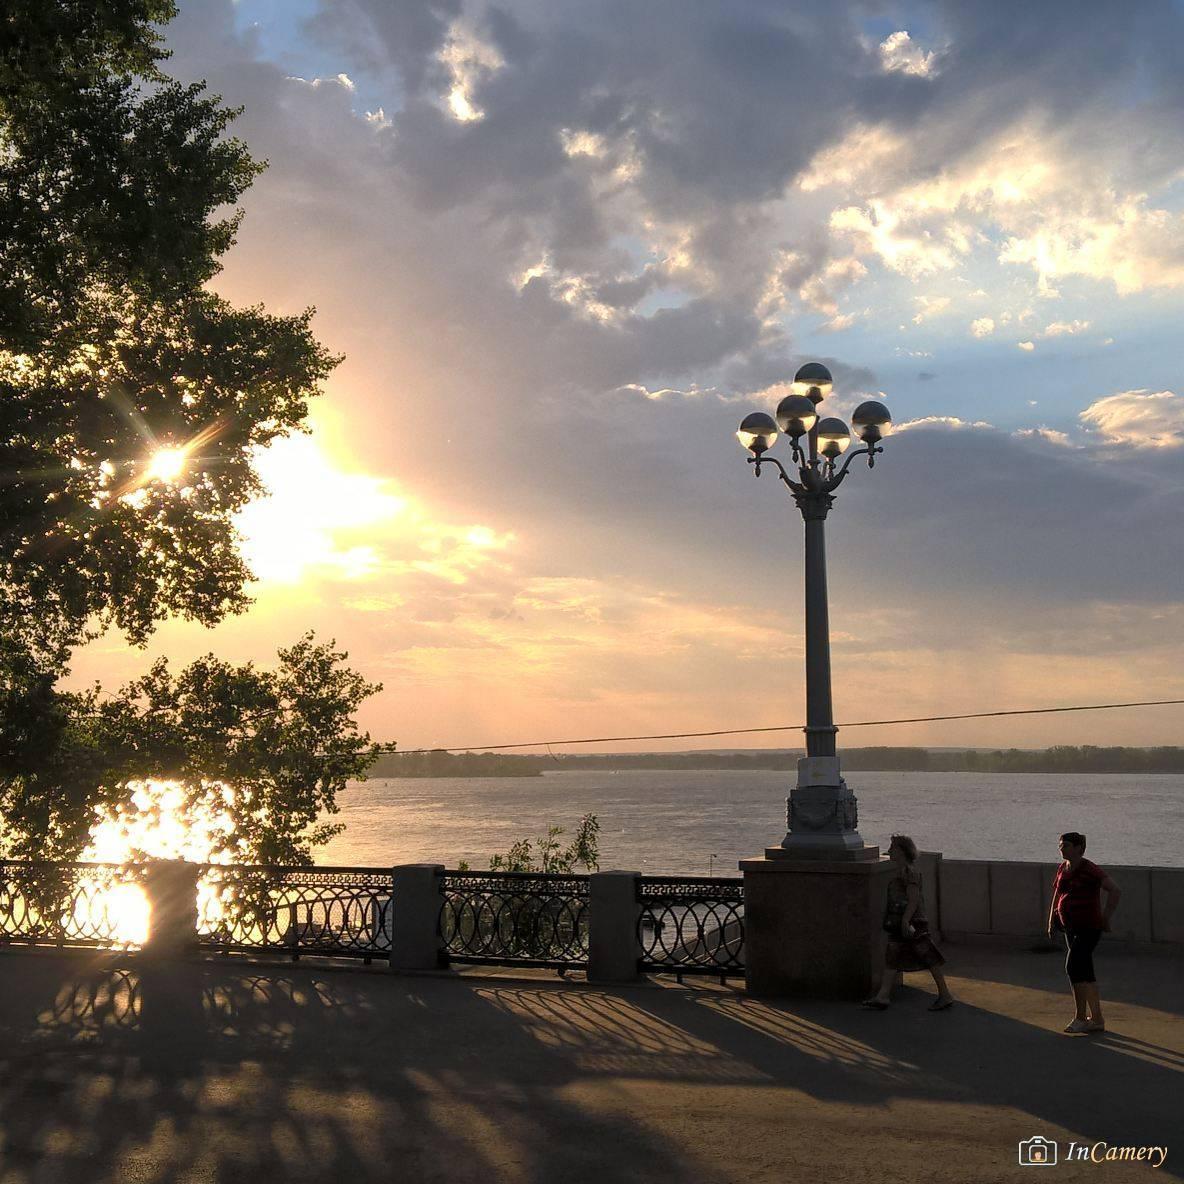 Набережная ....Самара...на реке Волга. фотография Наталья